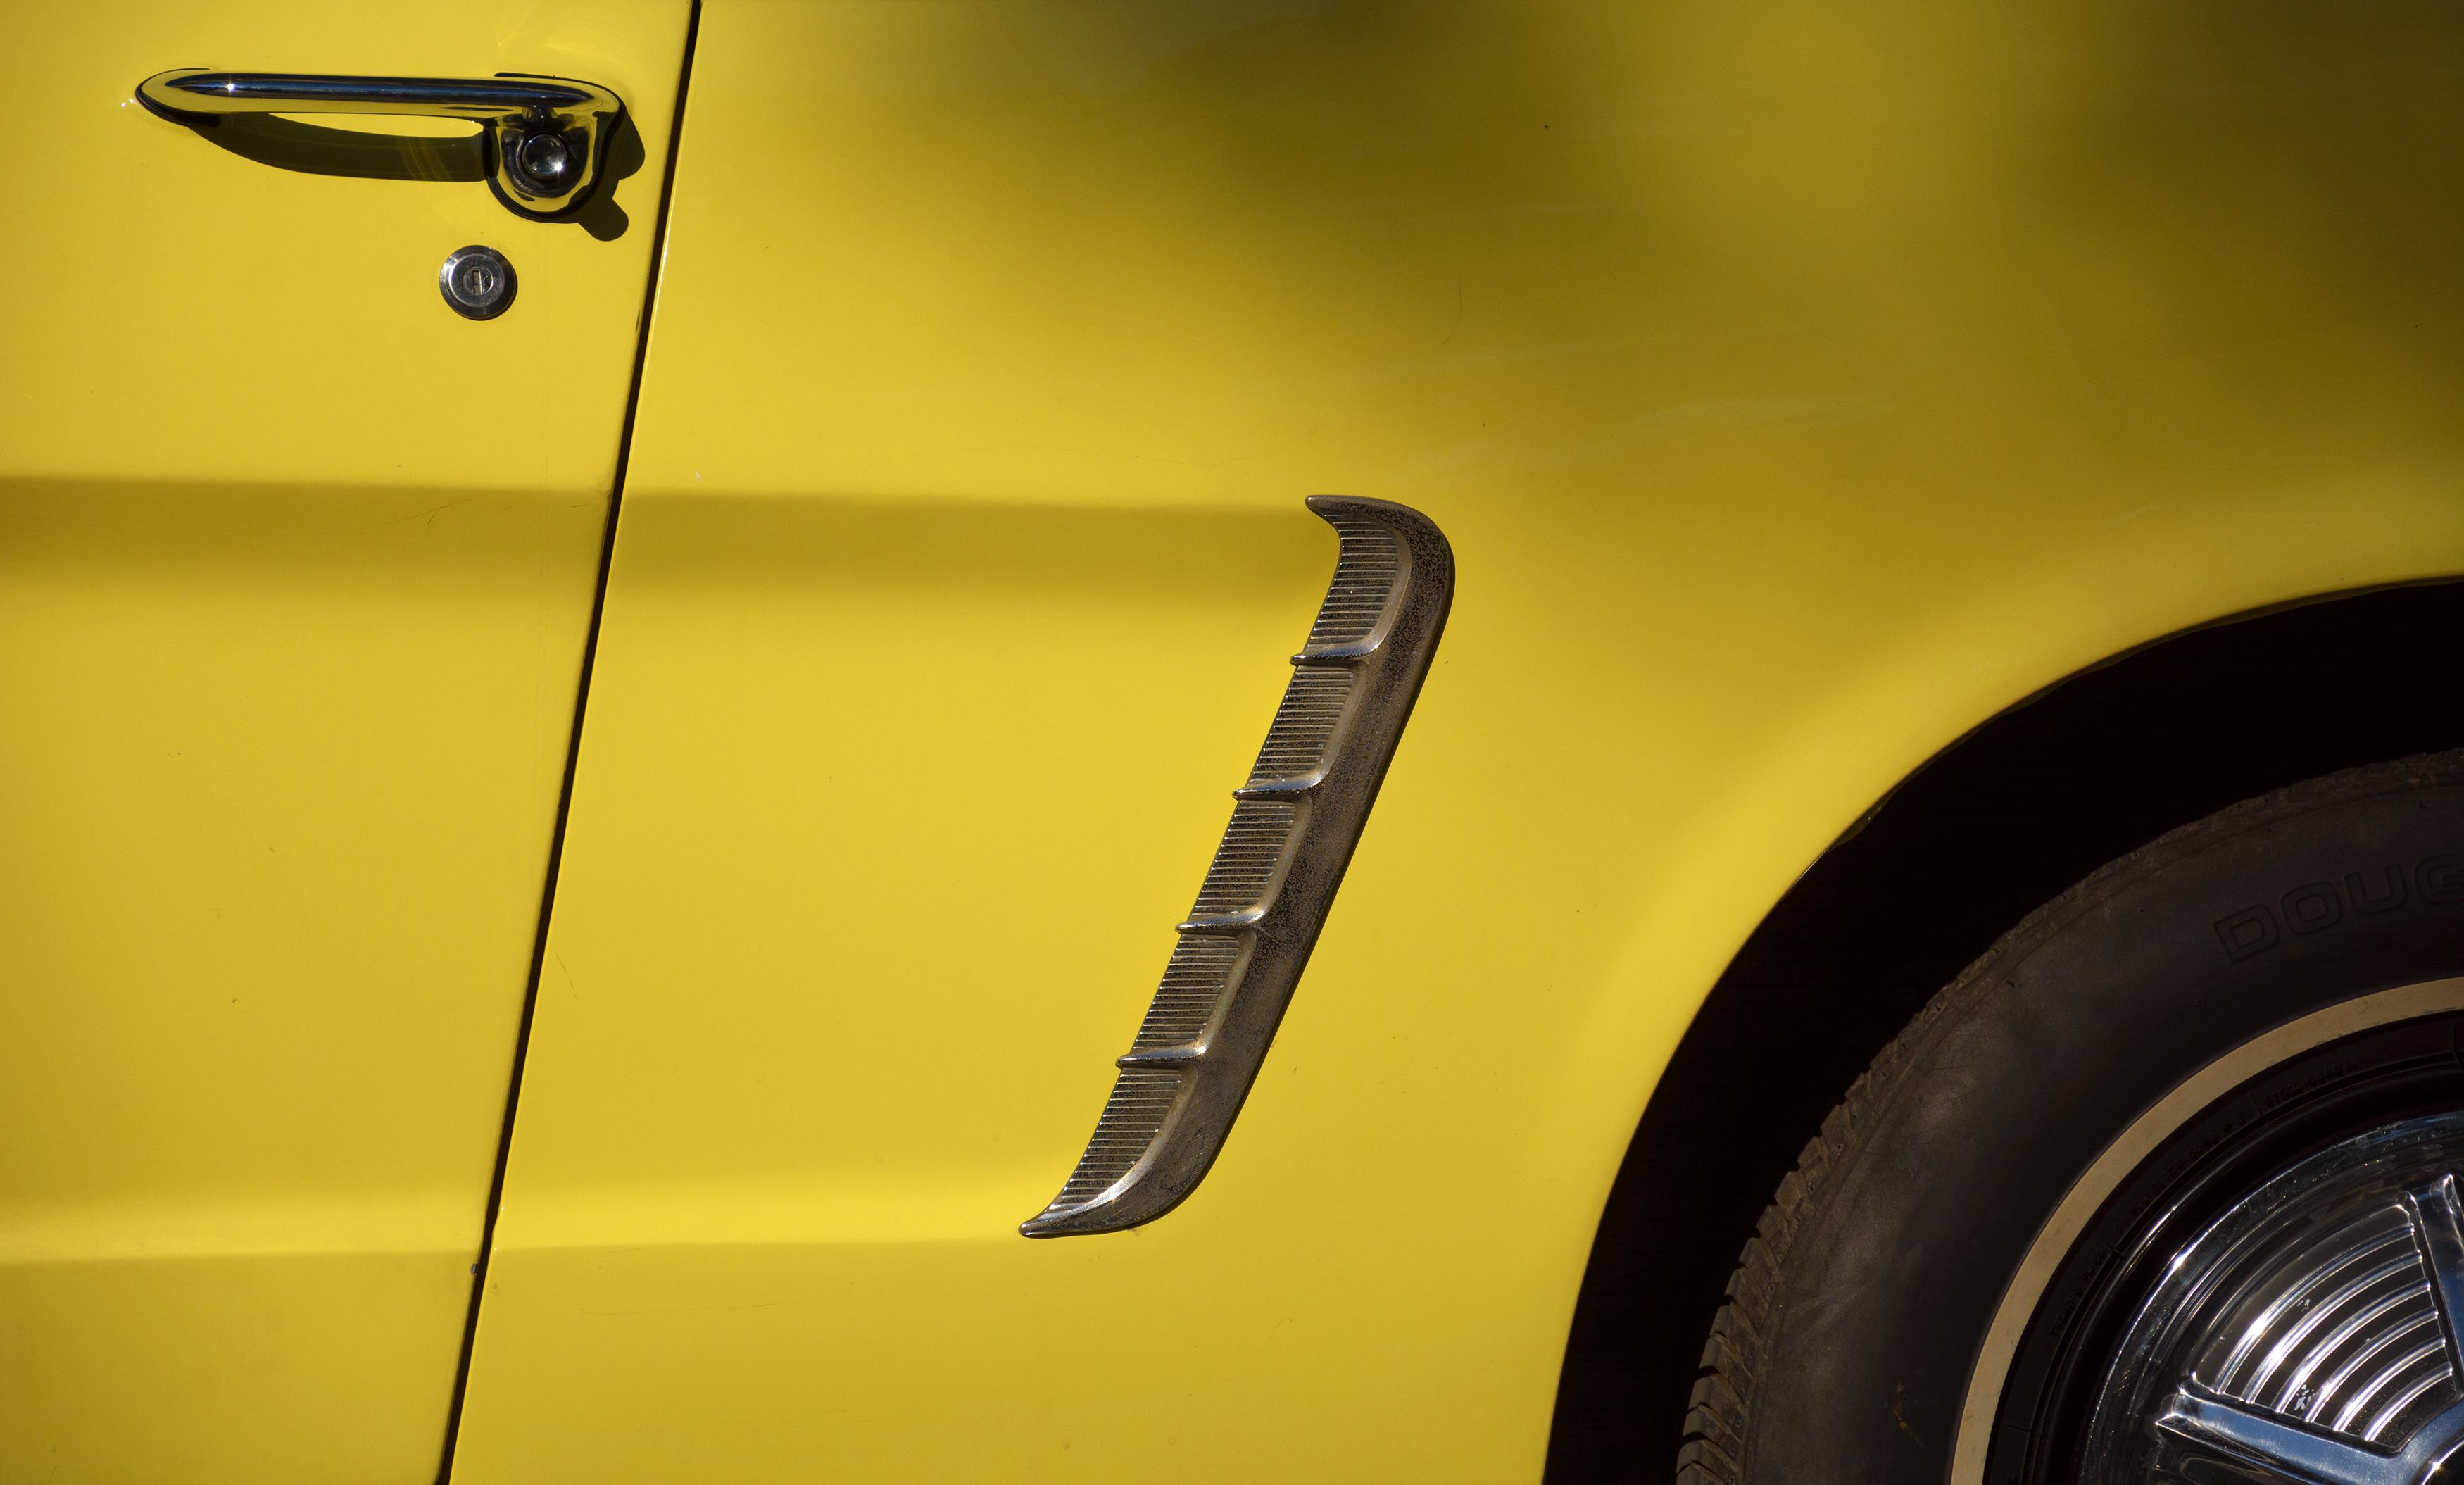 FREE IMAGE: Classic Yellow Car Detail - Libreshot Public Domain Photos